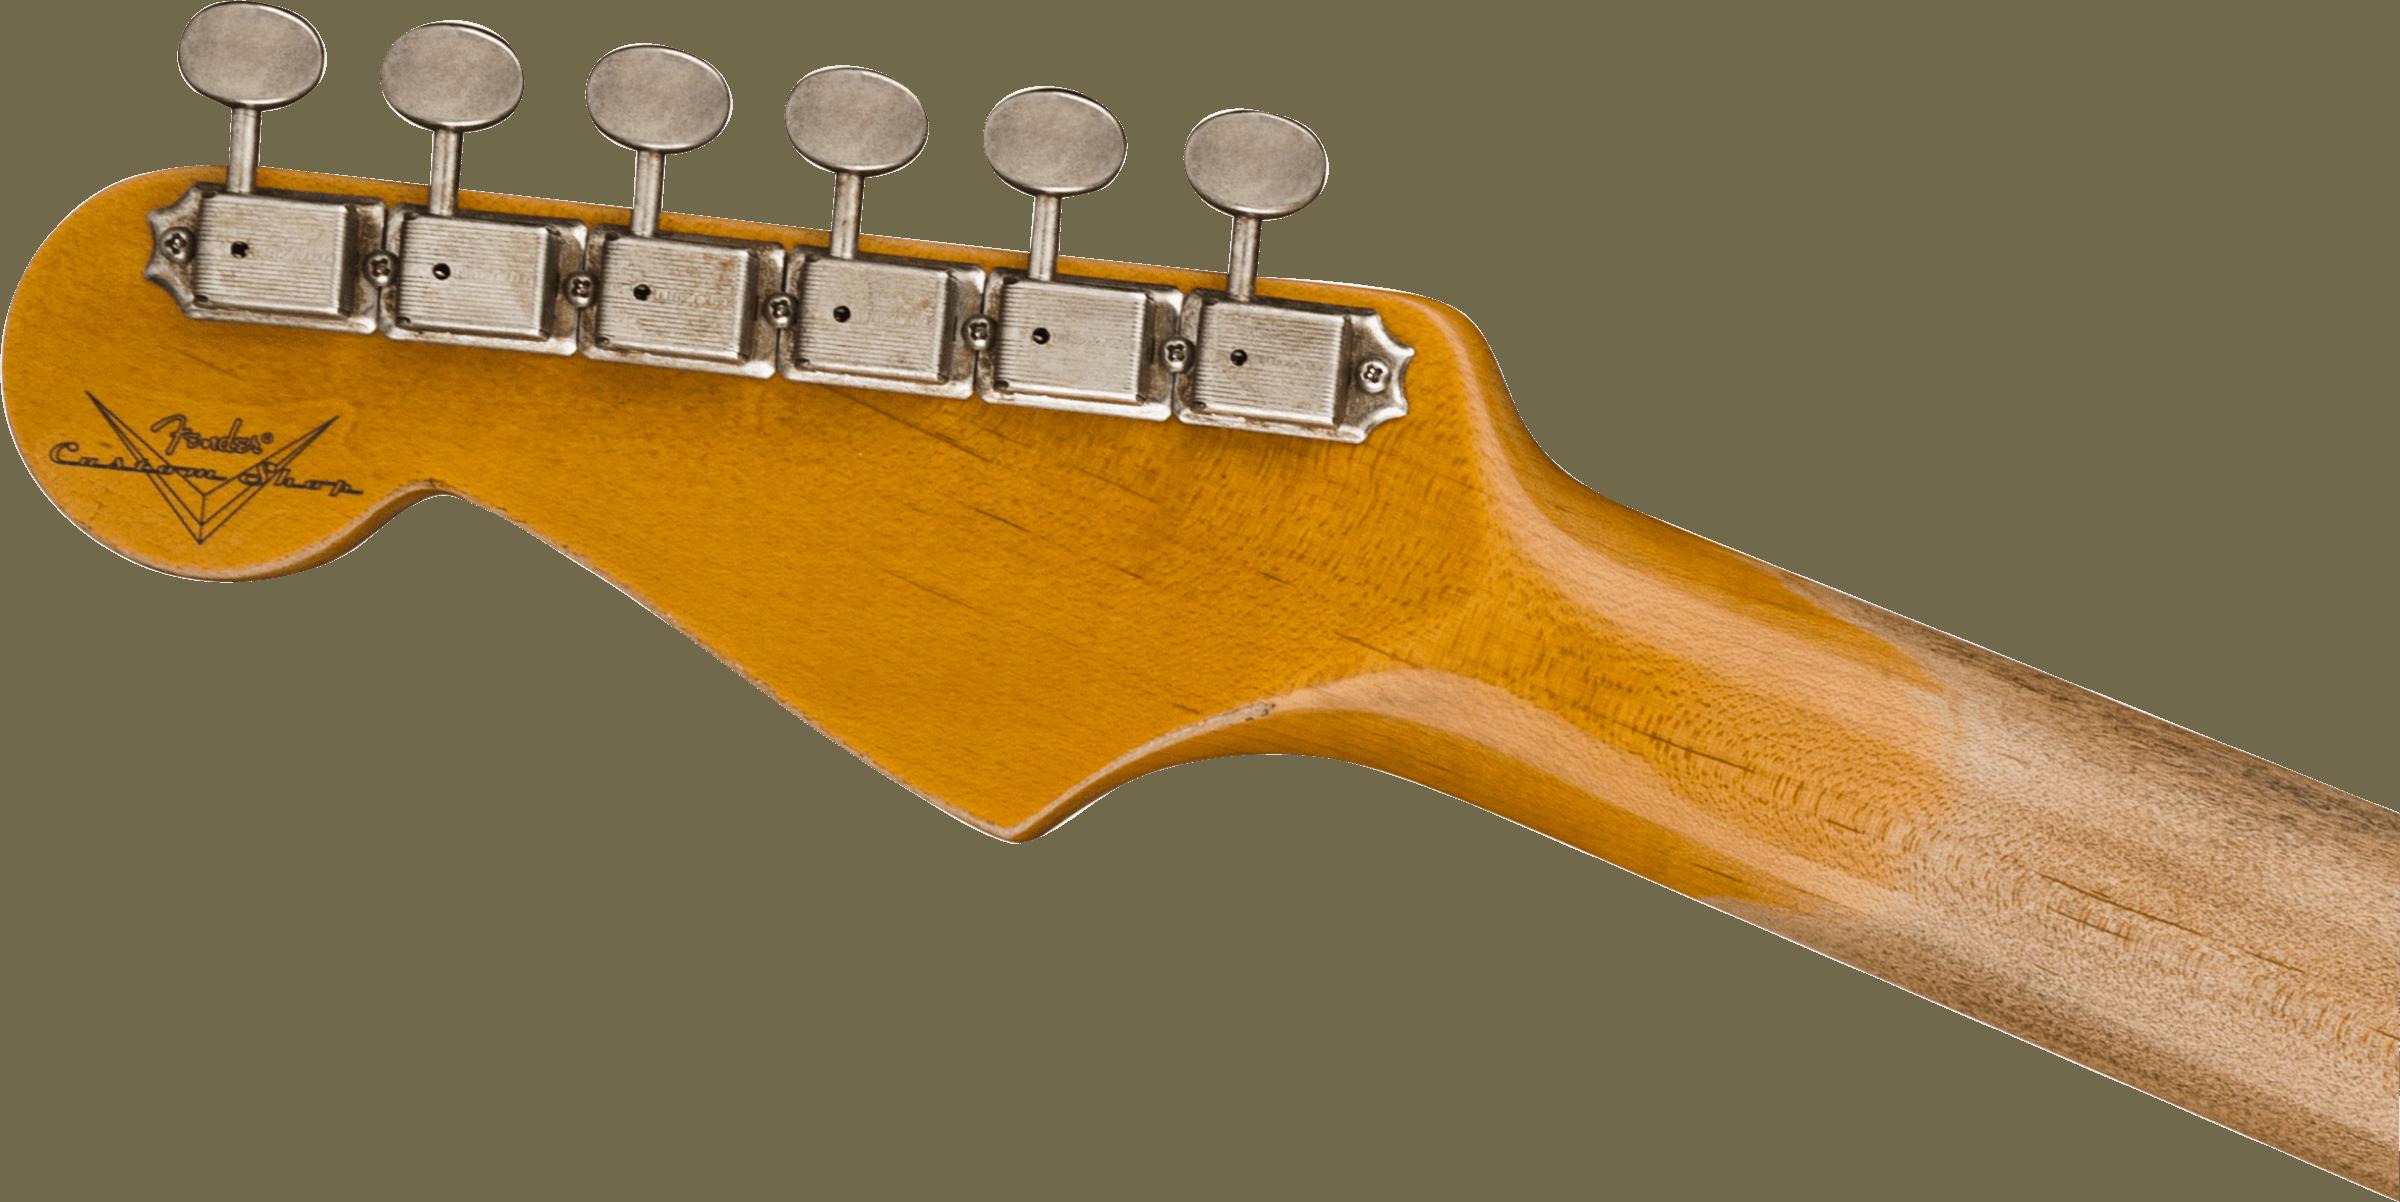 Fender Custom Shop 1960 Stratocaster® Heavy Relic®, Rosewood Fingerboard, Faded Aged 3-Color Sunburst